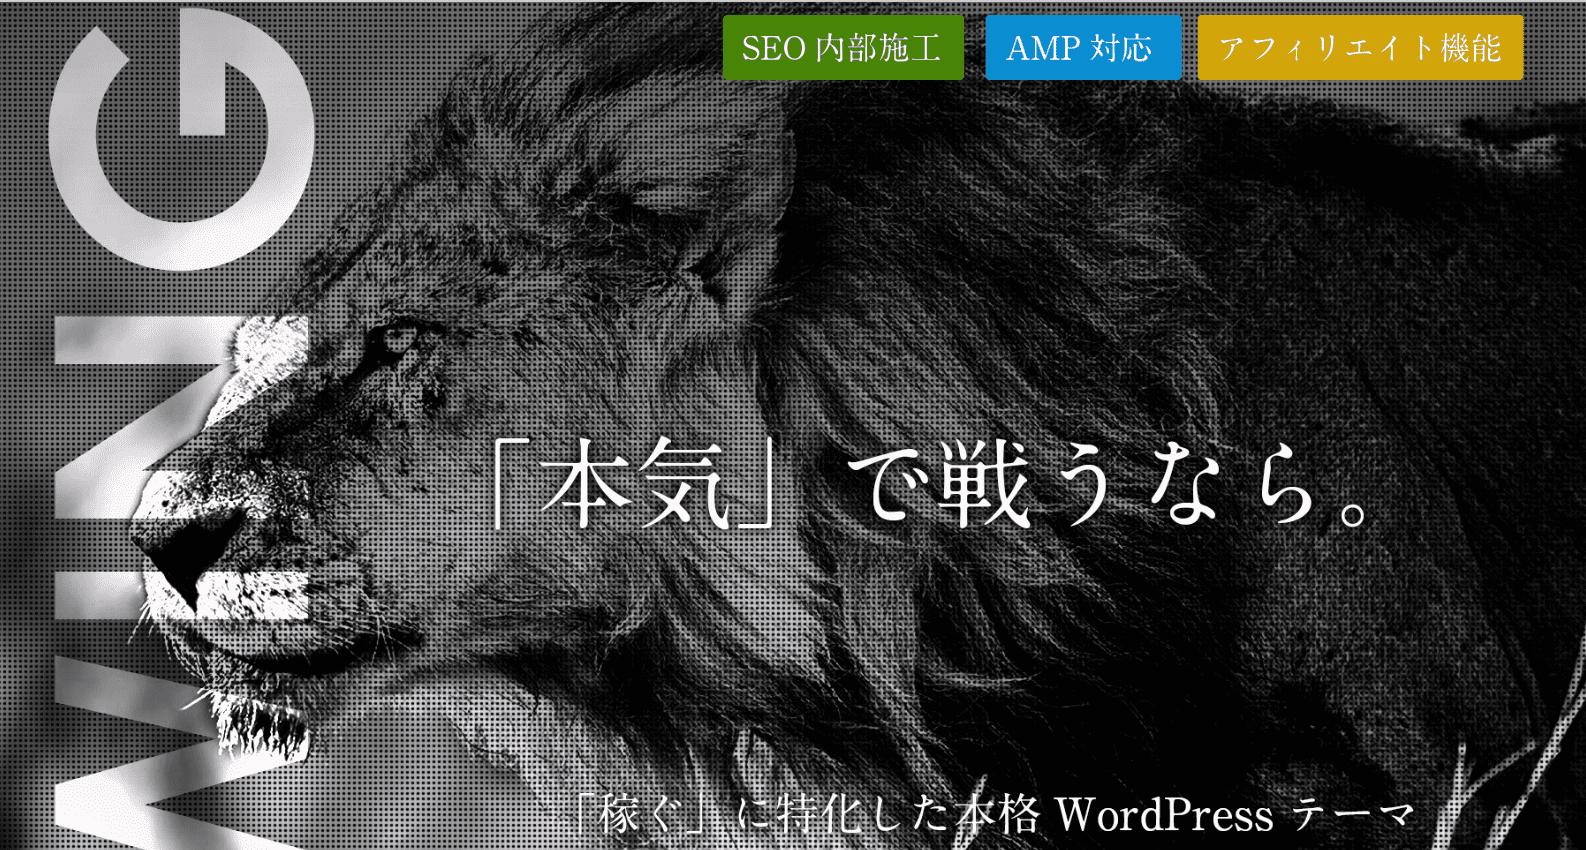 ①AFFINGER5(アフィンガー5):アフィリエイト向きWordPressテーマ